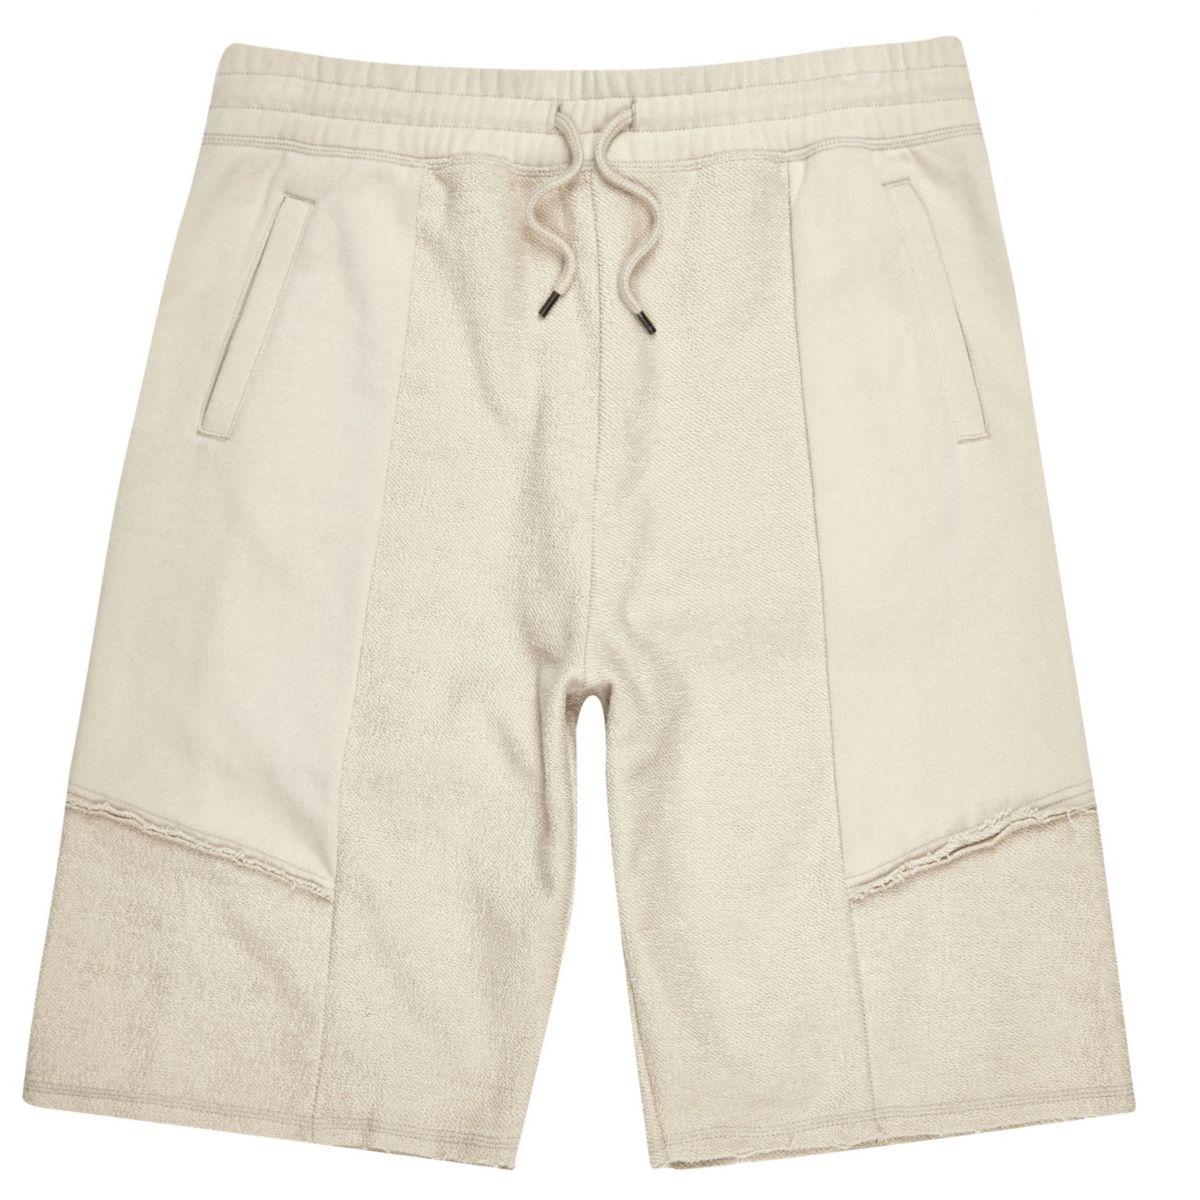 Stone reverse loopback shorts